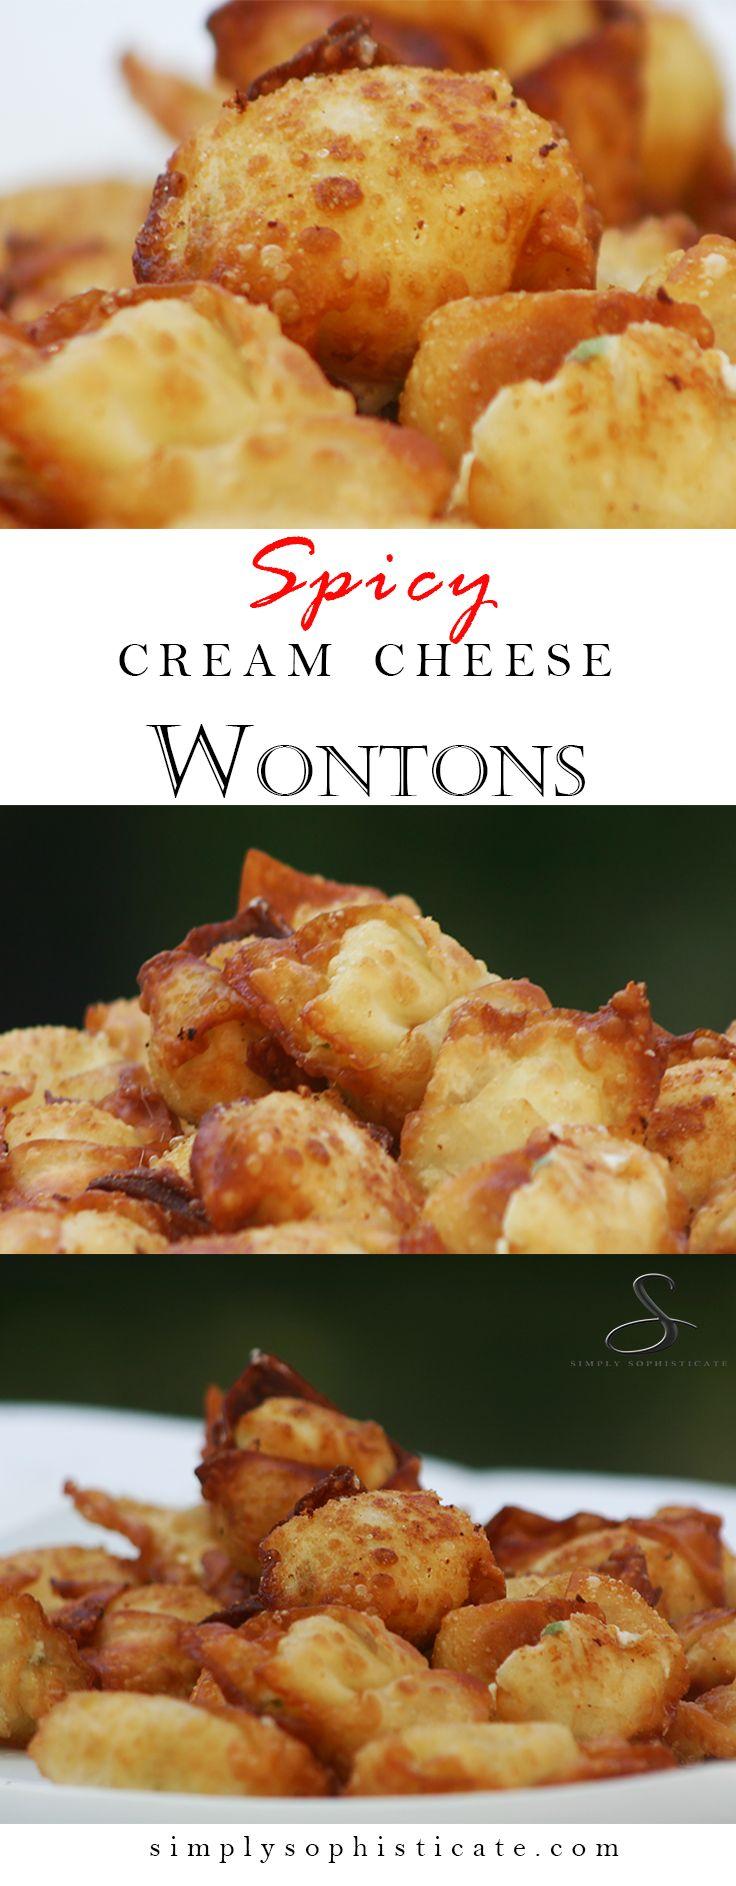 Spicy Cream Cheese Wontons